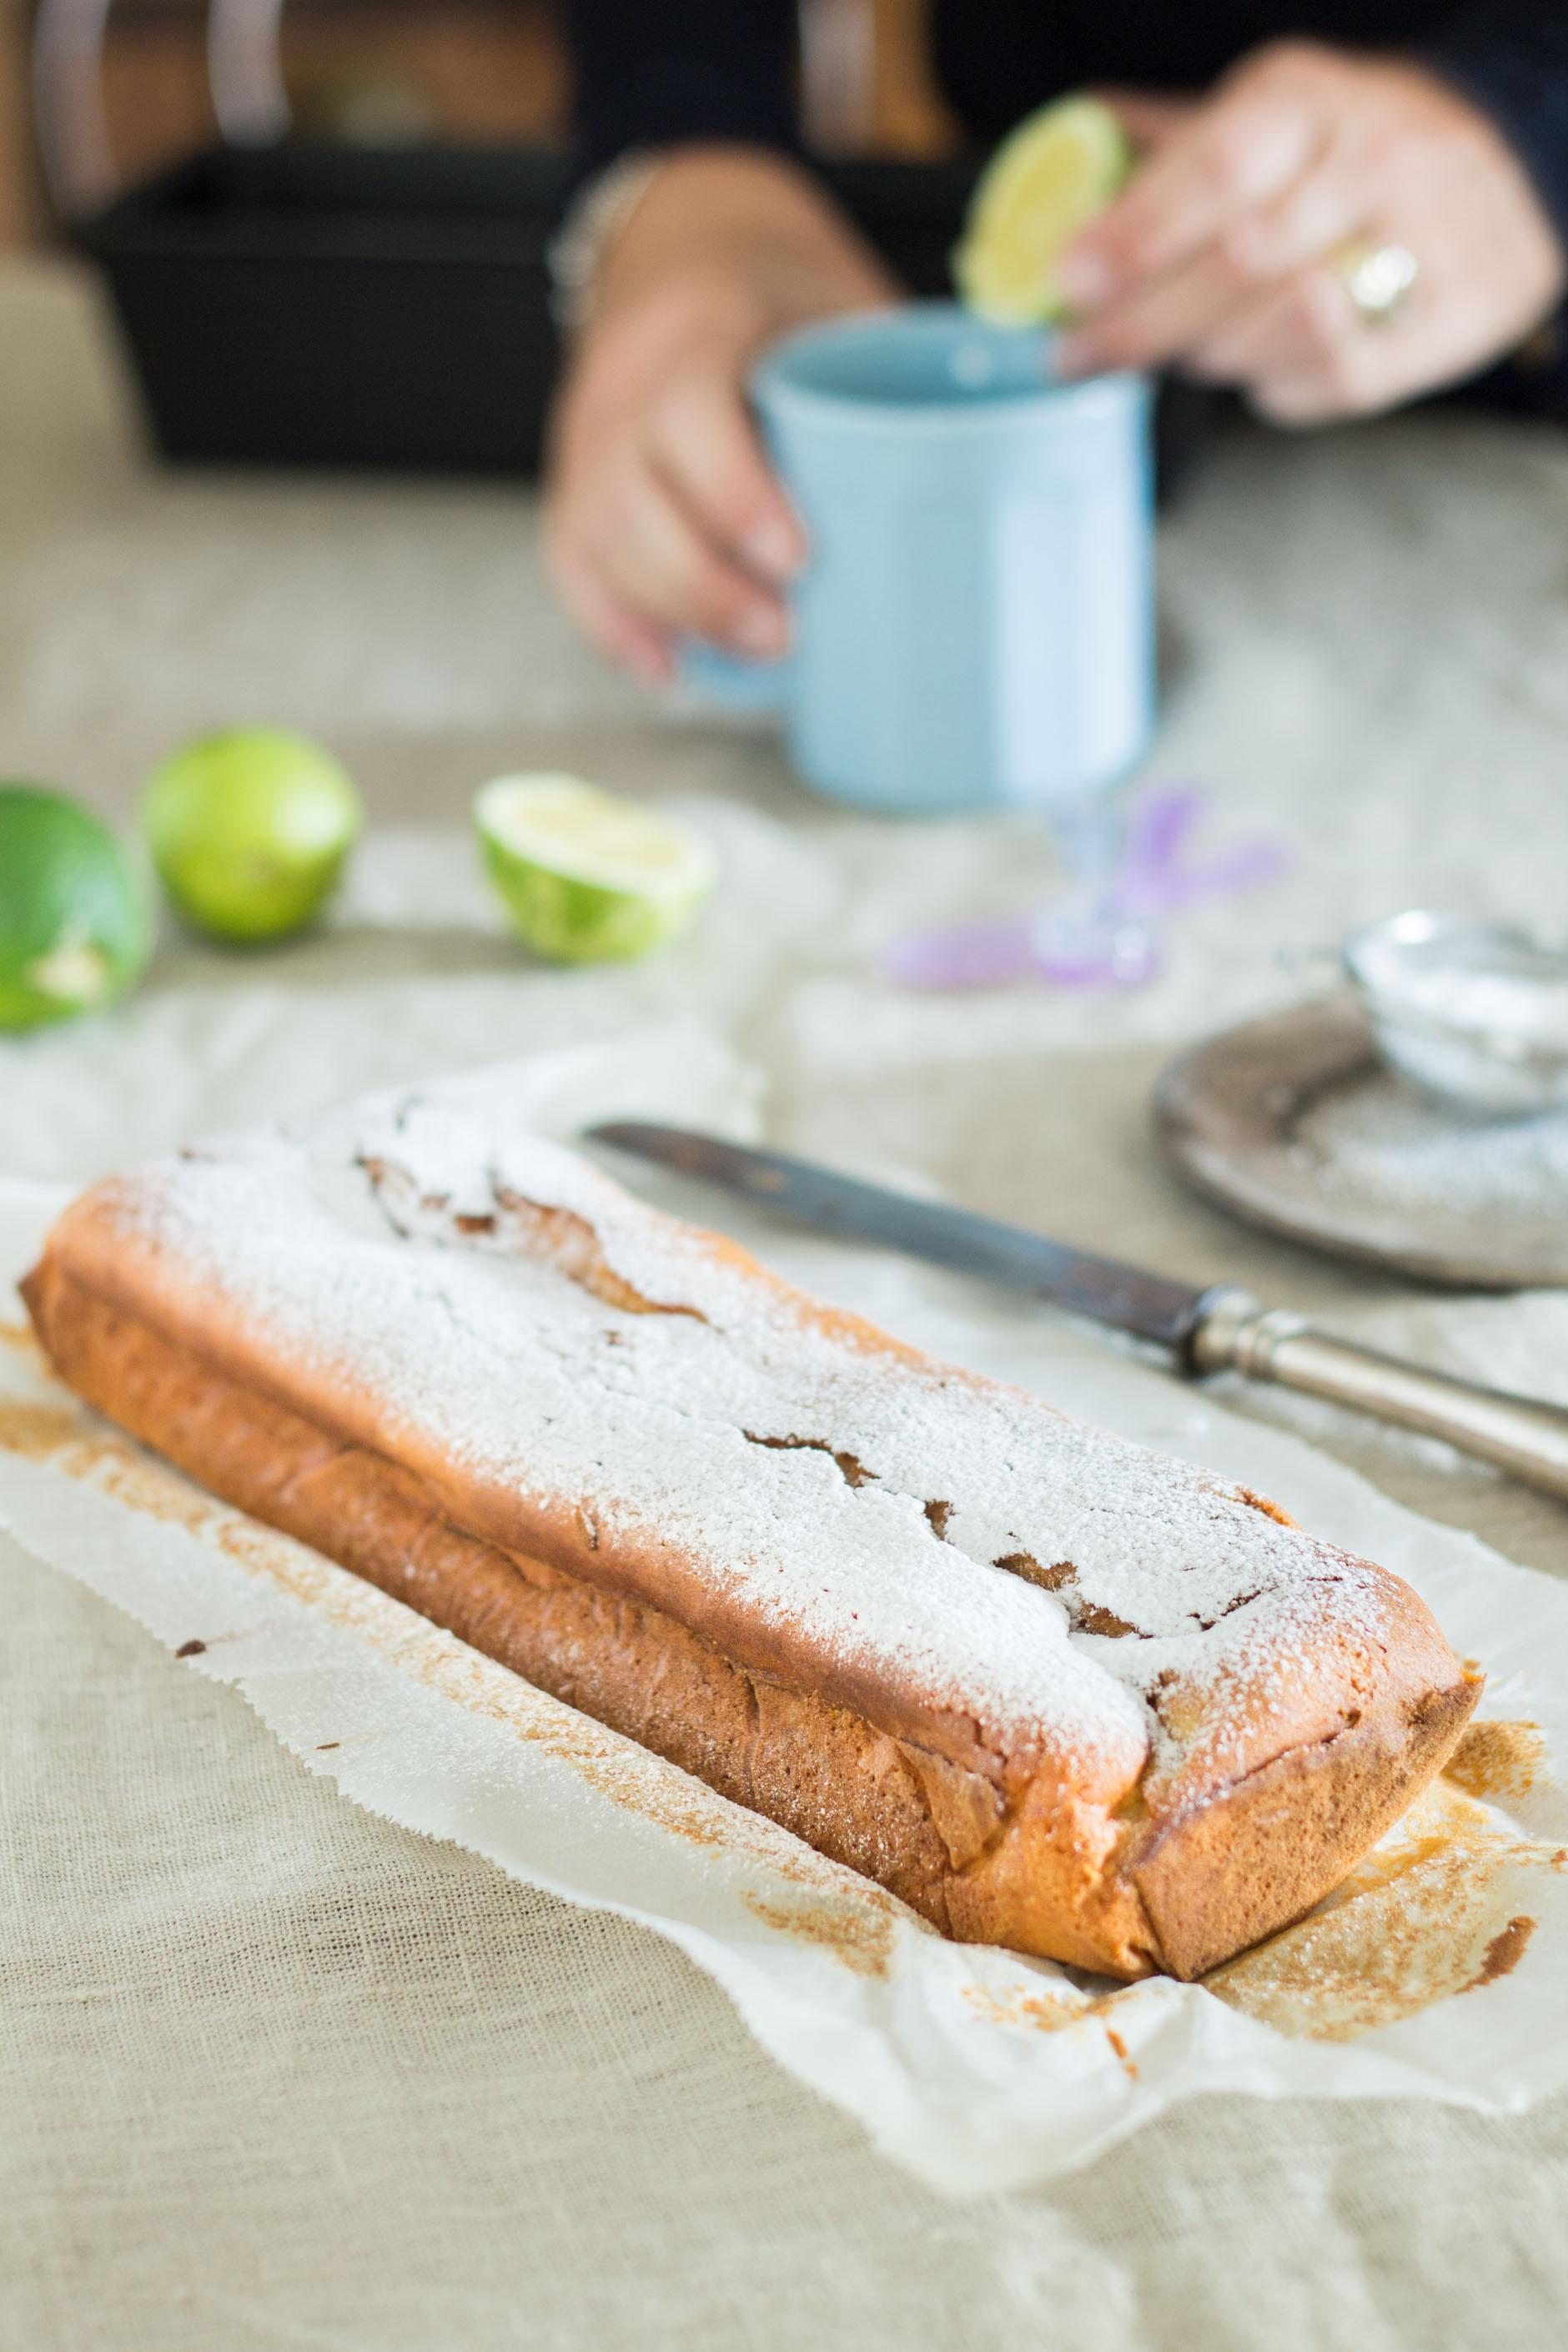 Plumcake al limone e yogurt senza glutine - Cardamomo & co